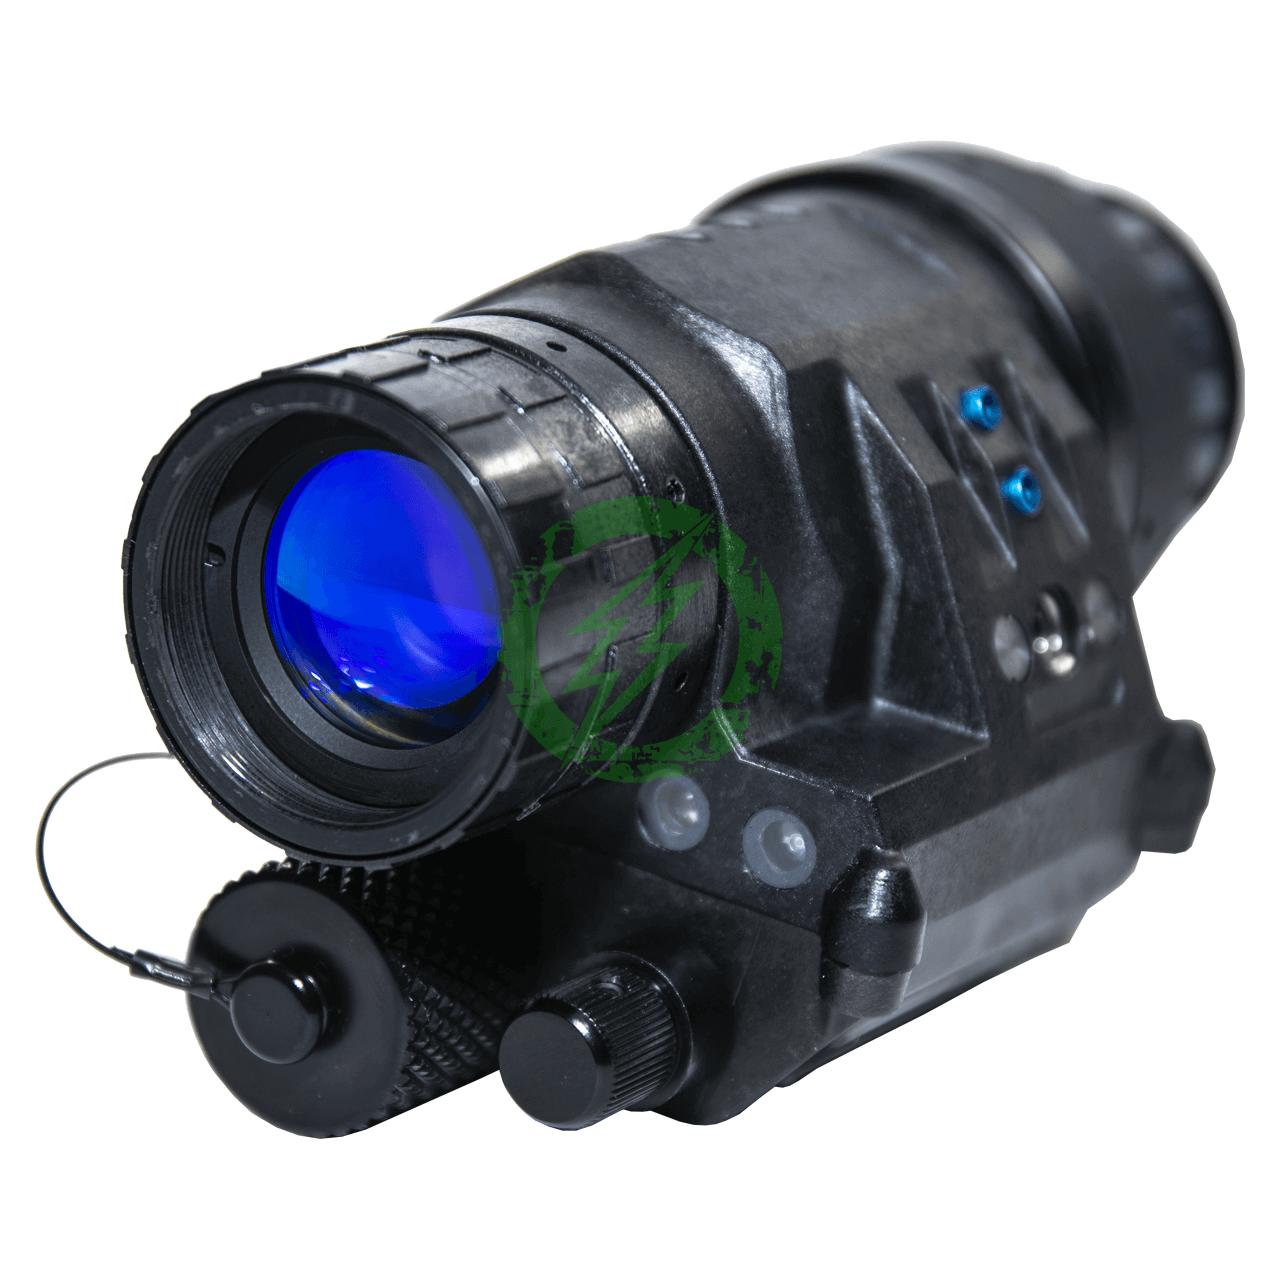 Photonis VYPER-14 with 4G ECHO White Phosphor Tube